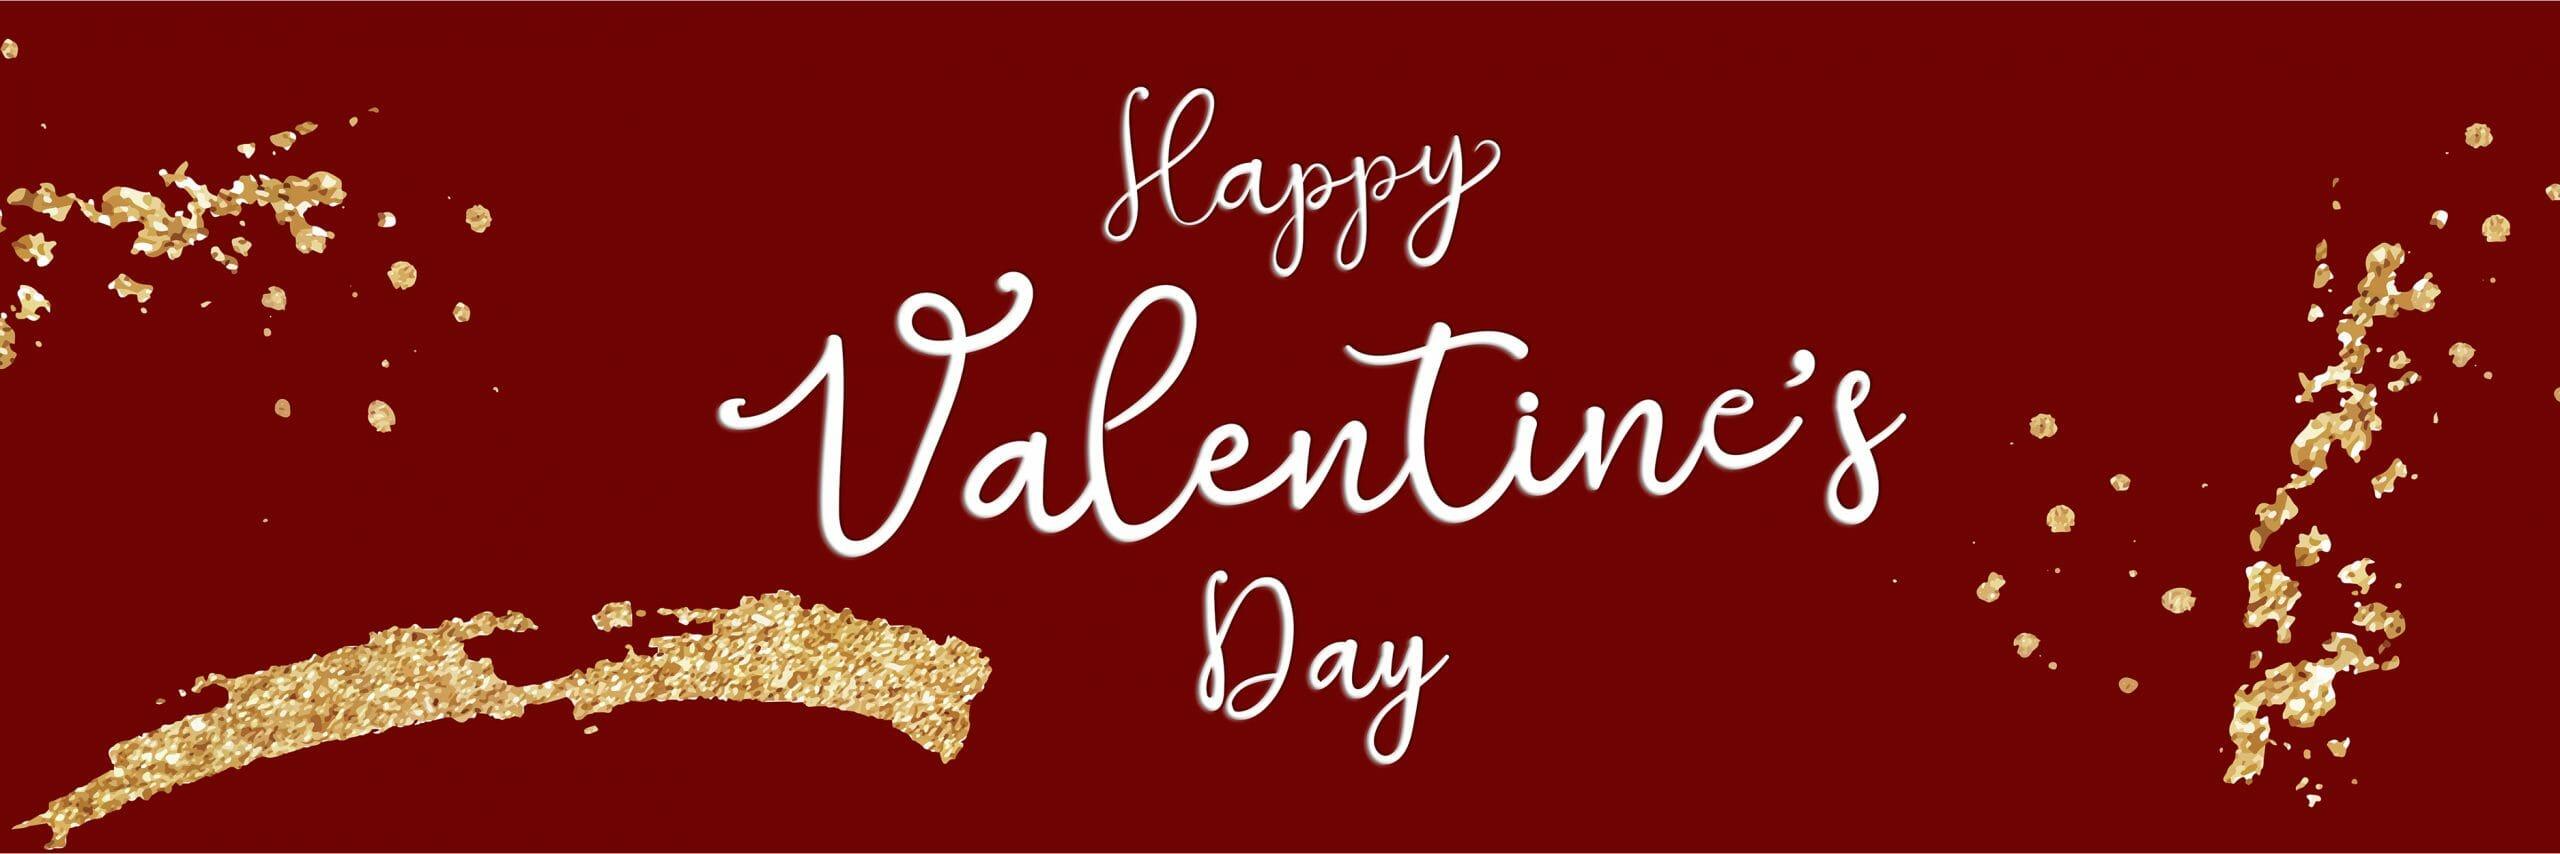 diamonds to delight for valentine's day | Diamonds for Valentine's | Valentine's gifts